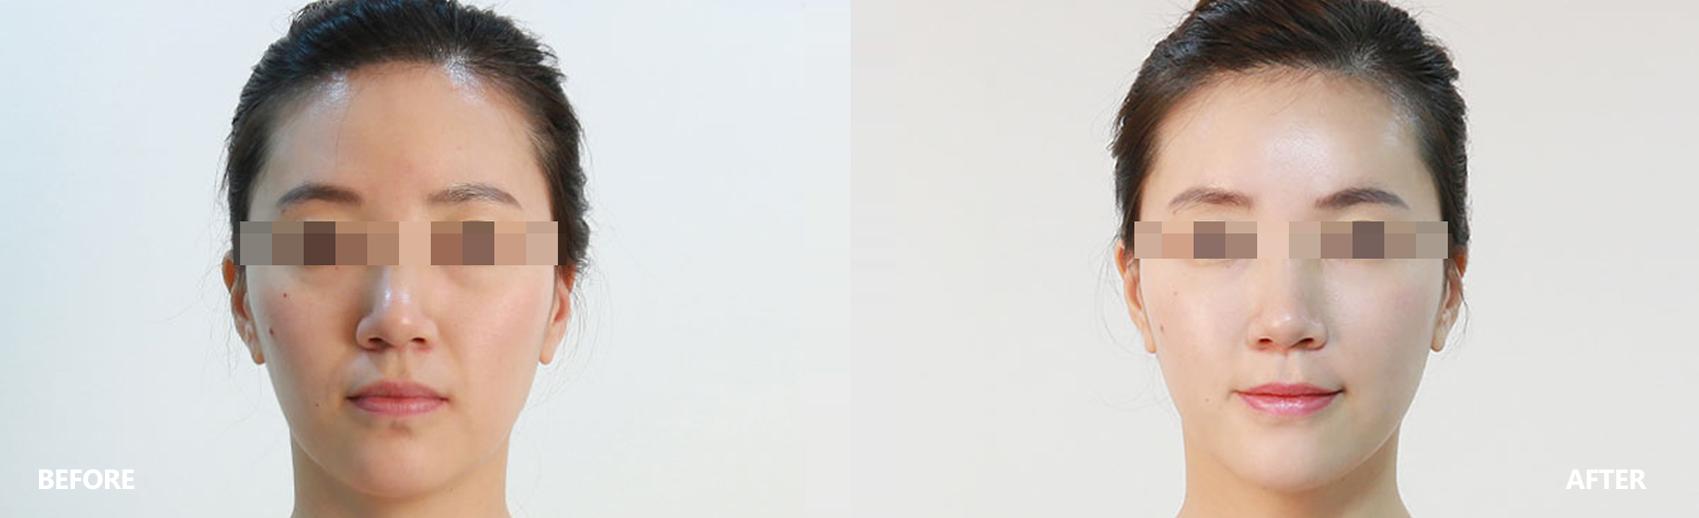 dry-result-banner-1